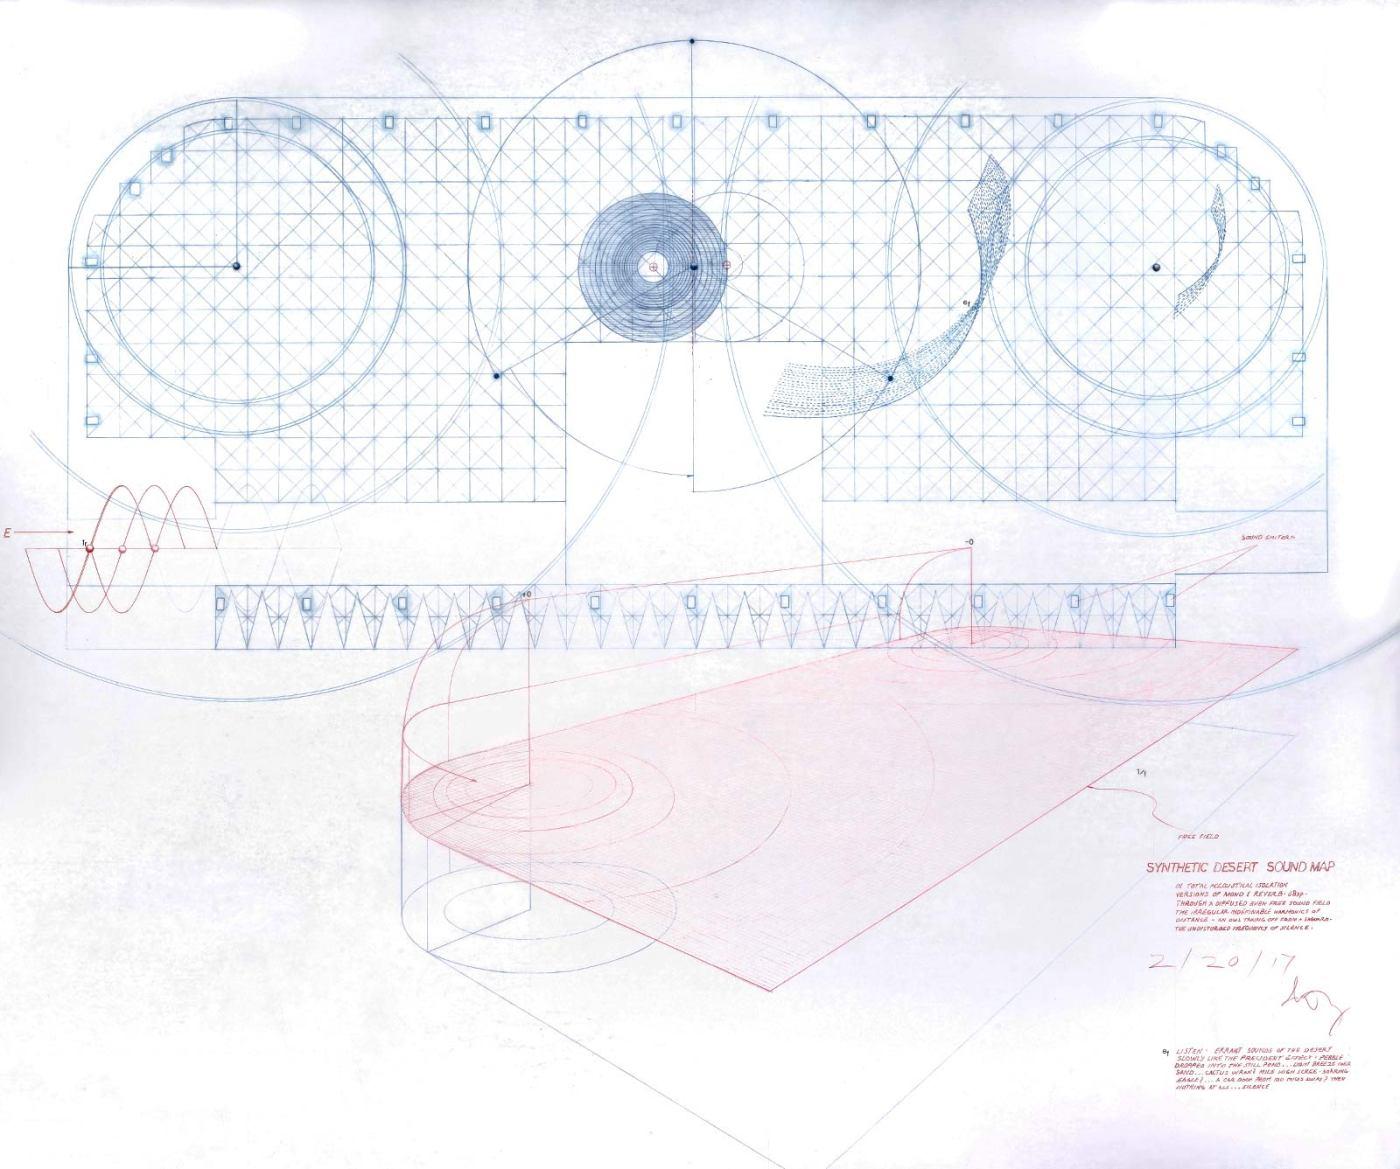 Wheeler-SyntheticDesert-SoundMap-crop10